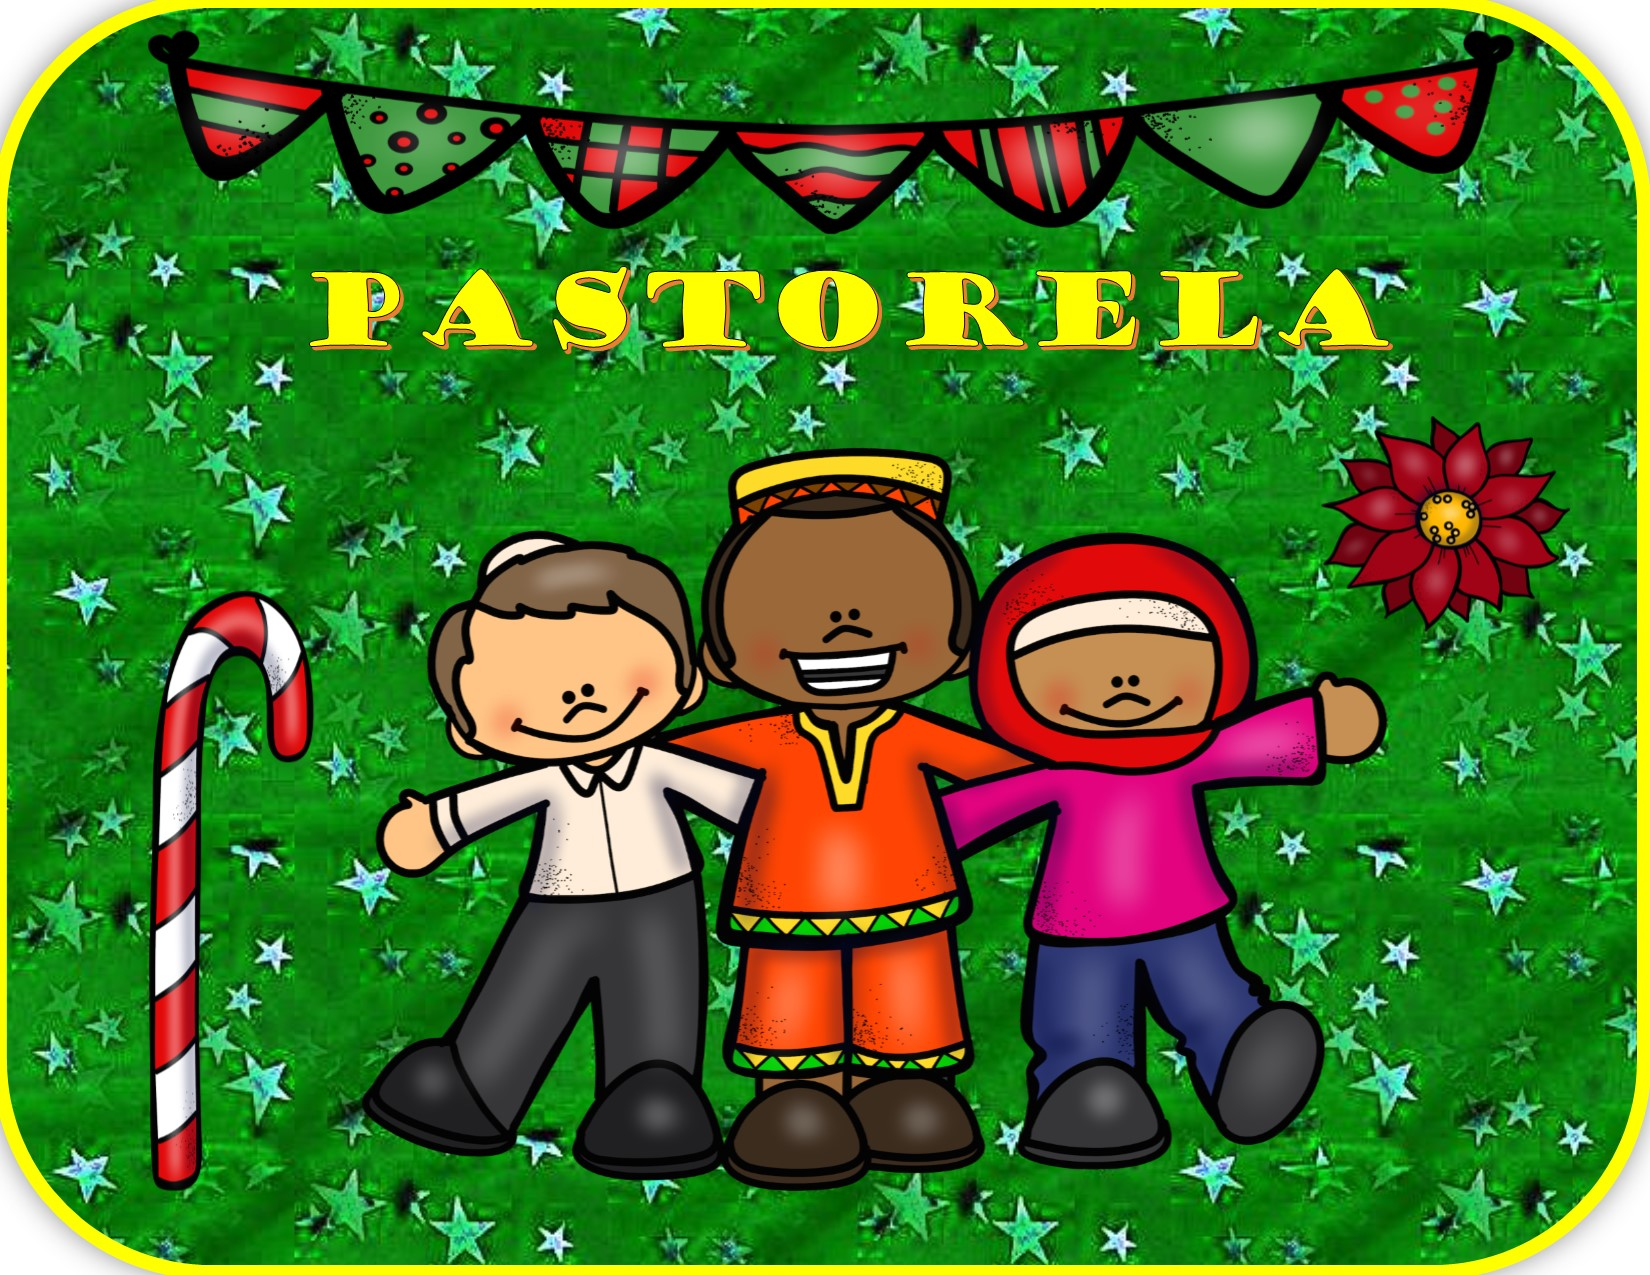 pastorela1